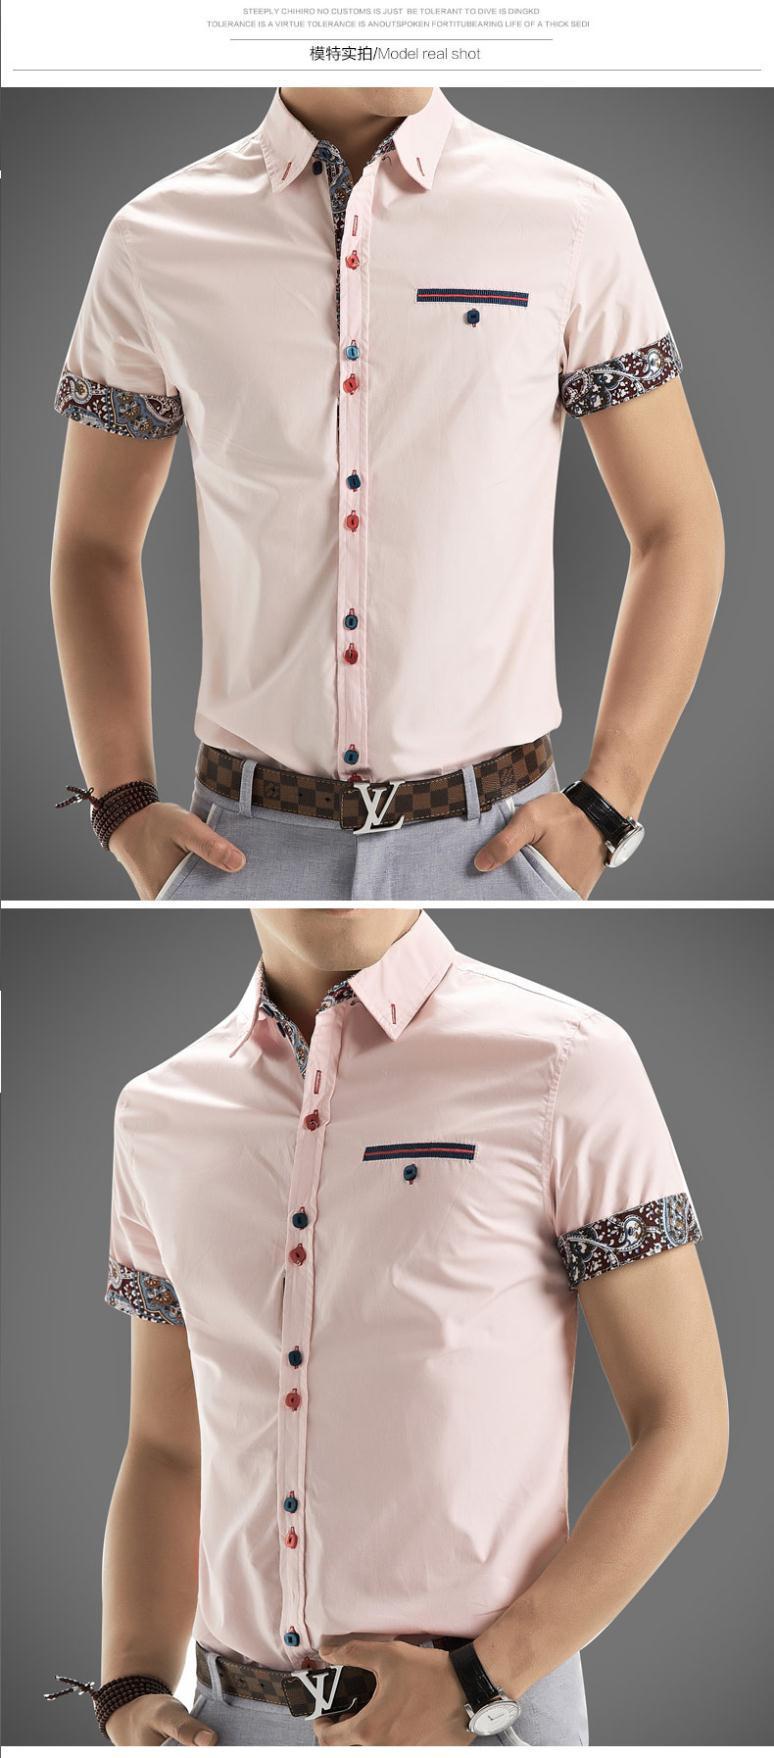 2015 Men Shirt New Brand Shirts Short Sleeve Casual Shirt Men Slim Fit Brand Design Formal Shirt Camisa Social Chemise Homme7